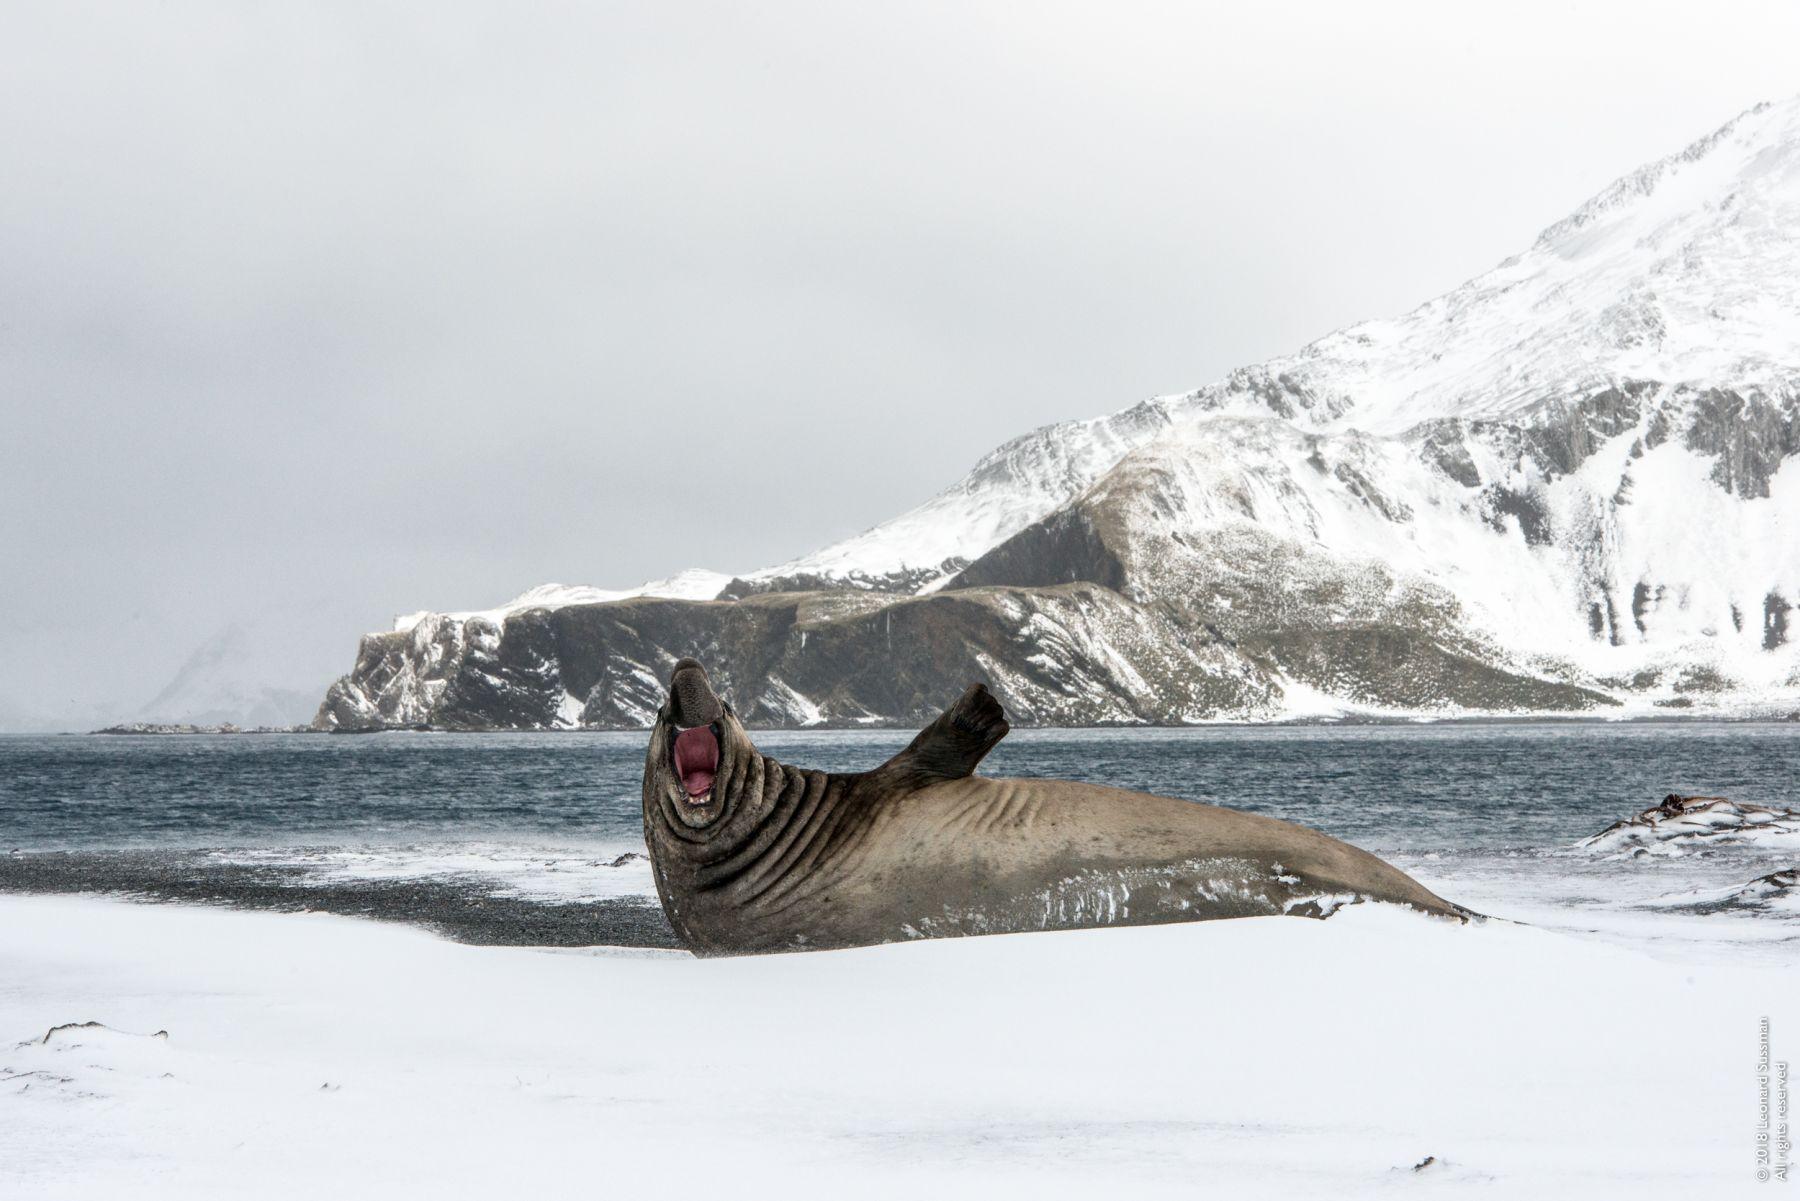 Elephant Seal Barking, Right Whale Bay, South Georgia Islands